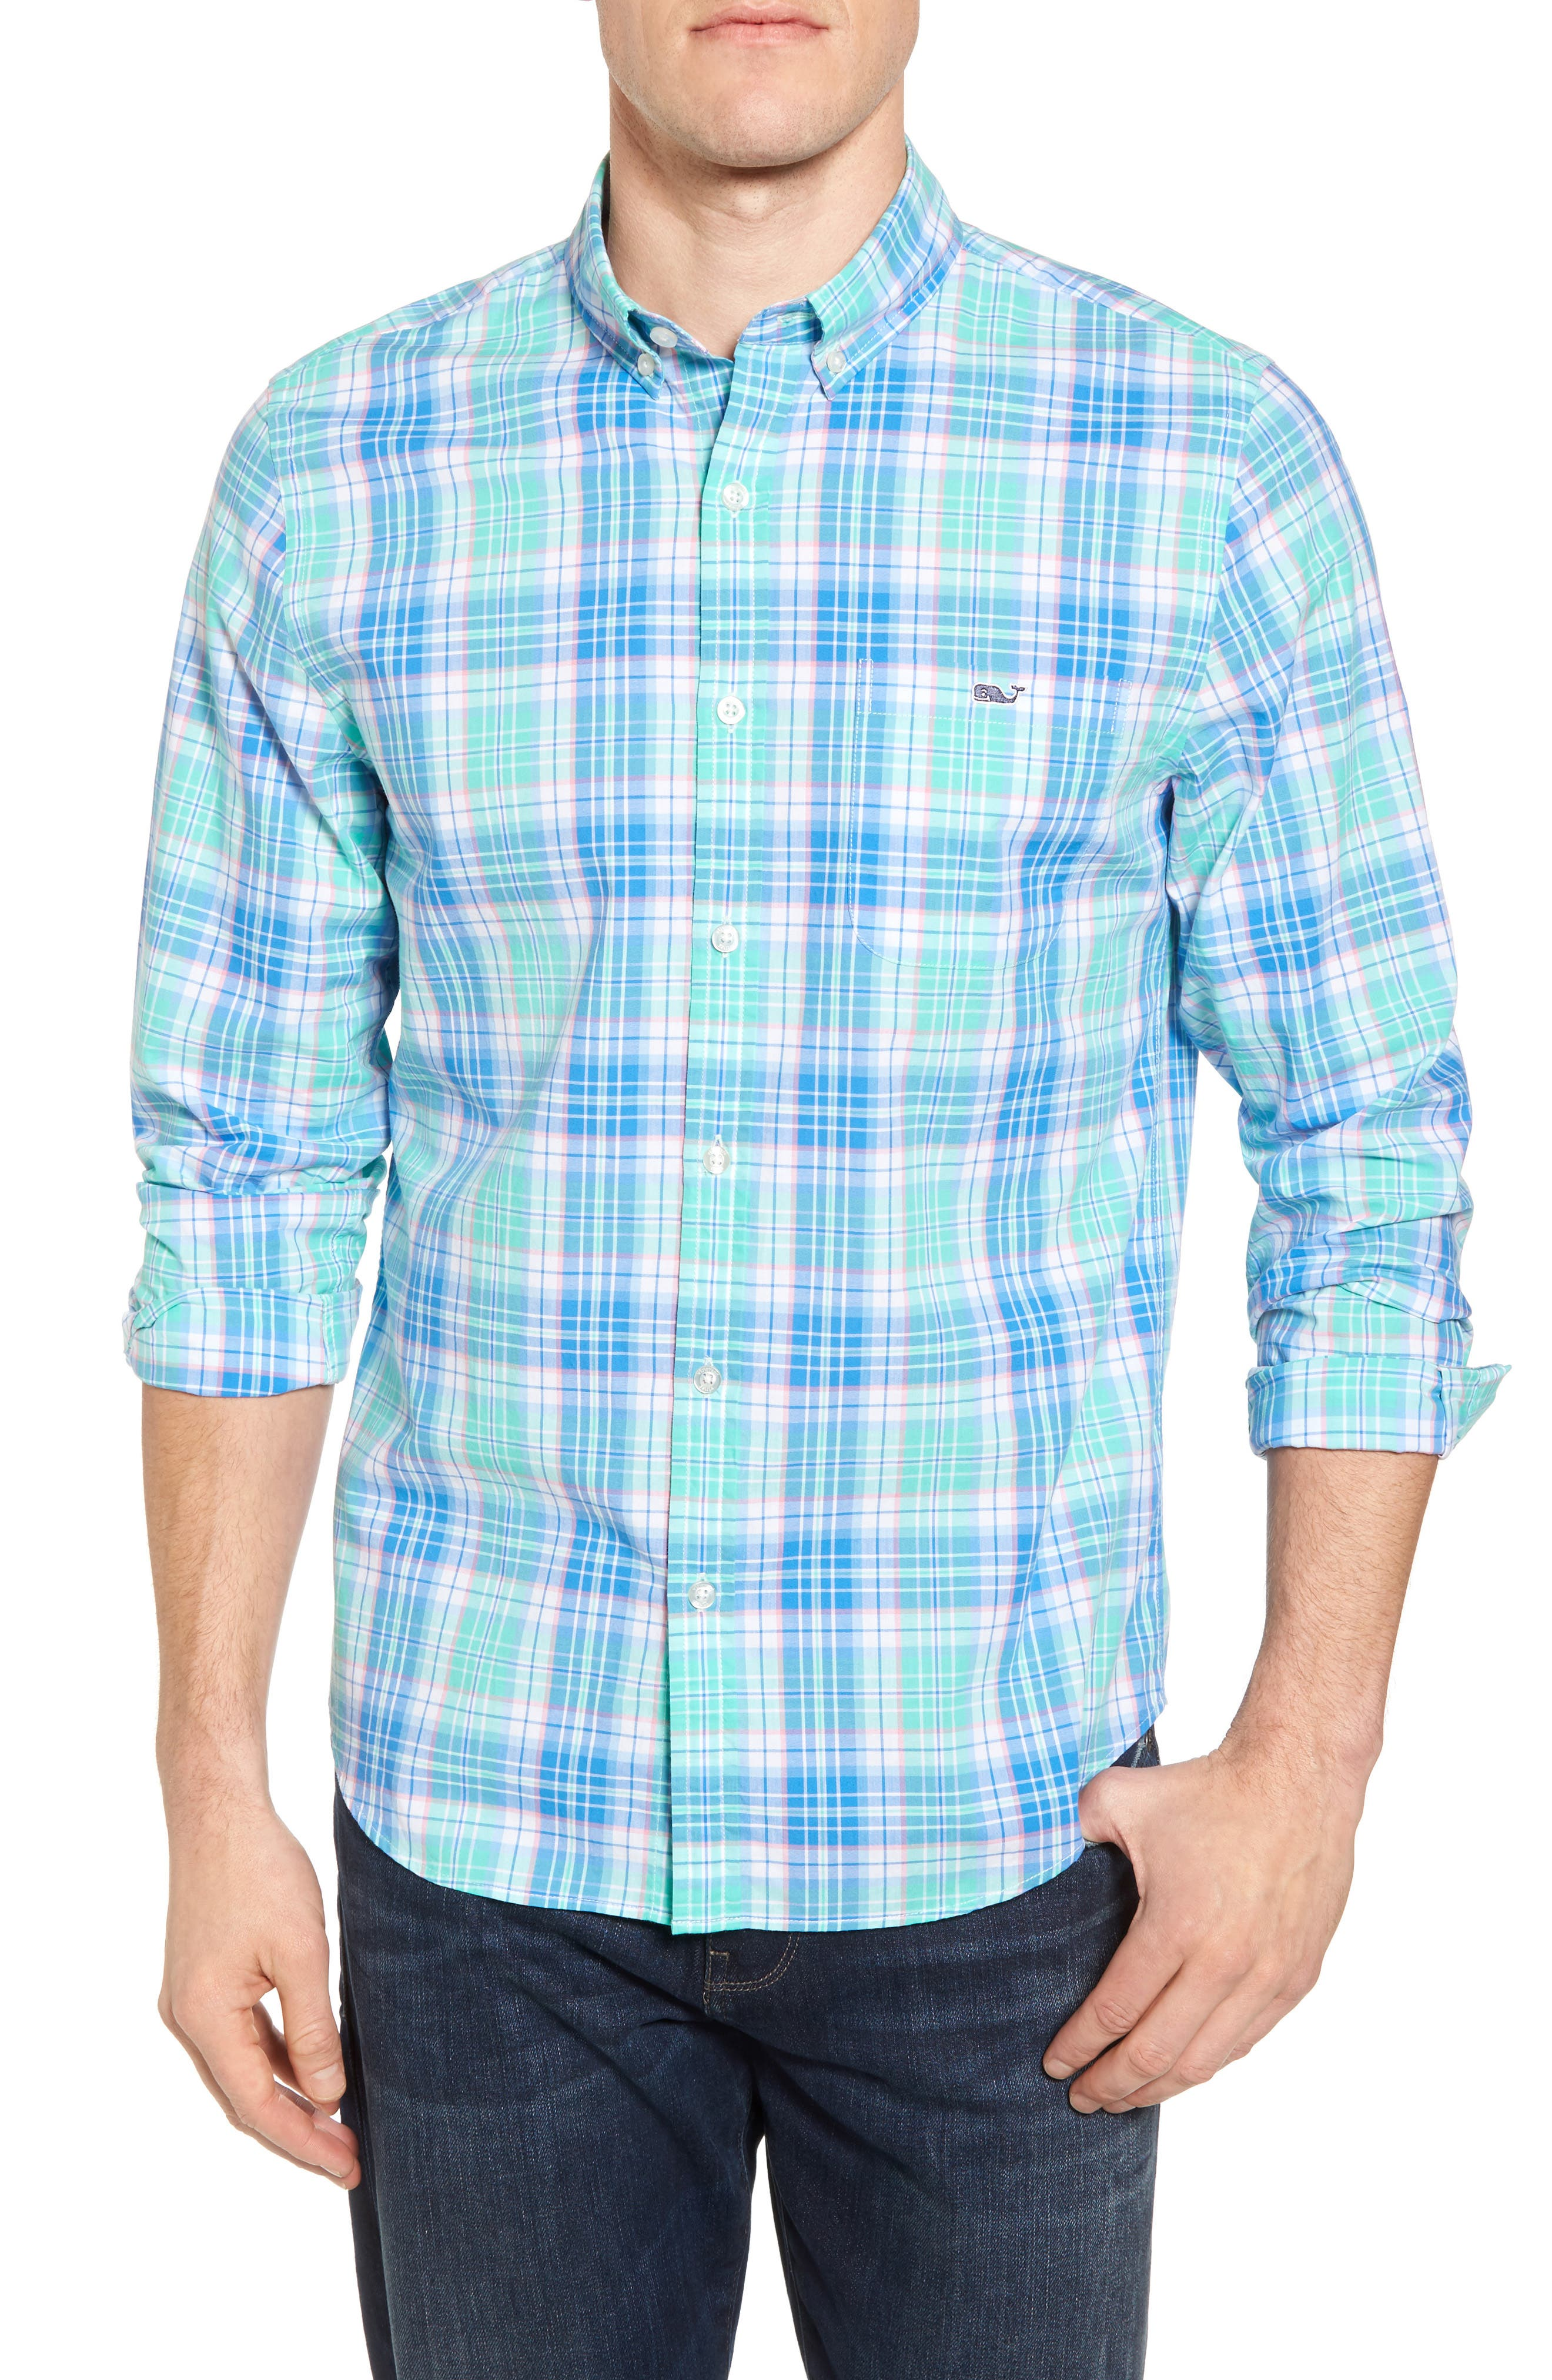 Sutherland Road Slim Fit Plaid Sport Shirt,                             Main thumbnail 1, color,                             359